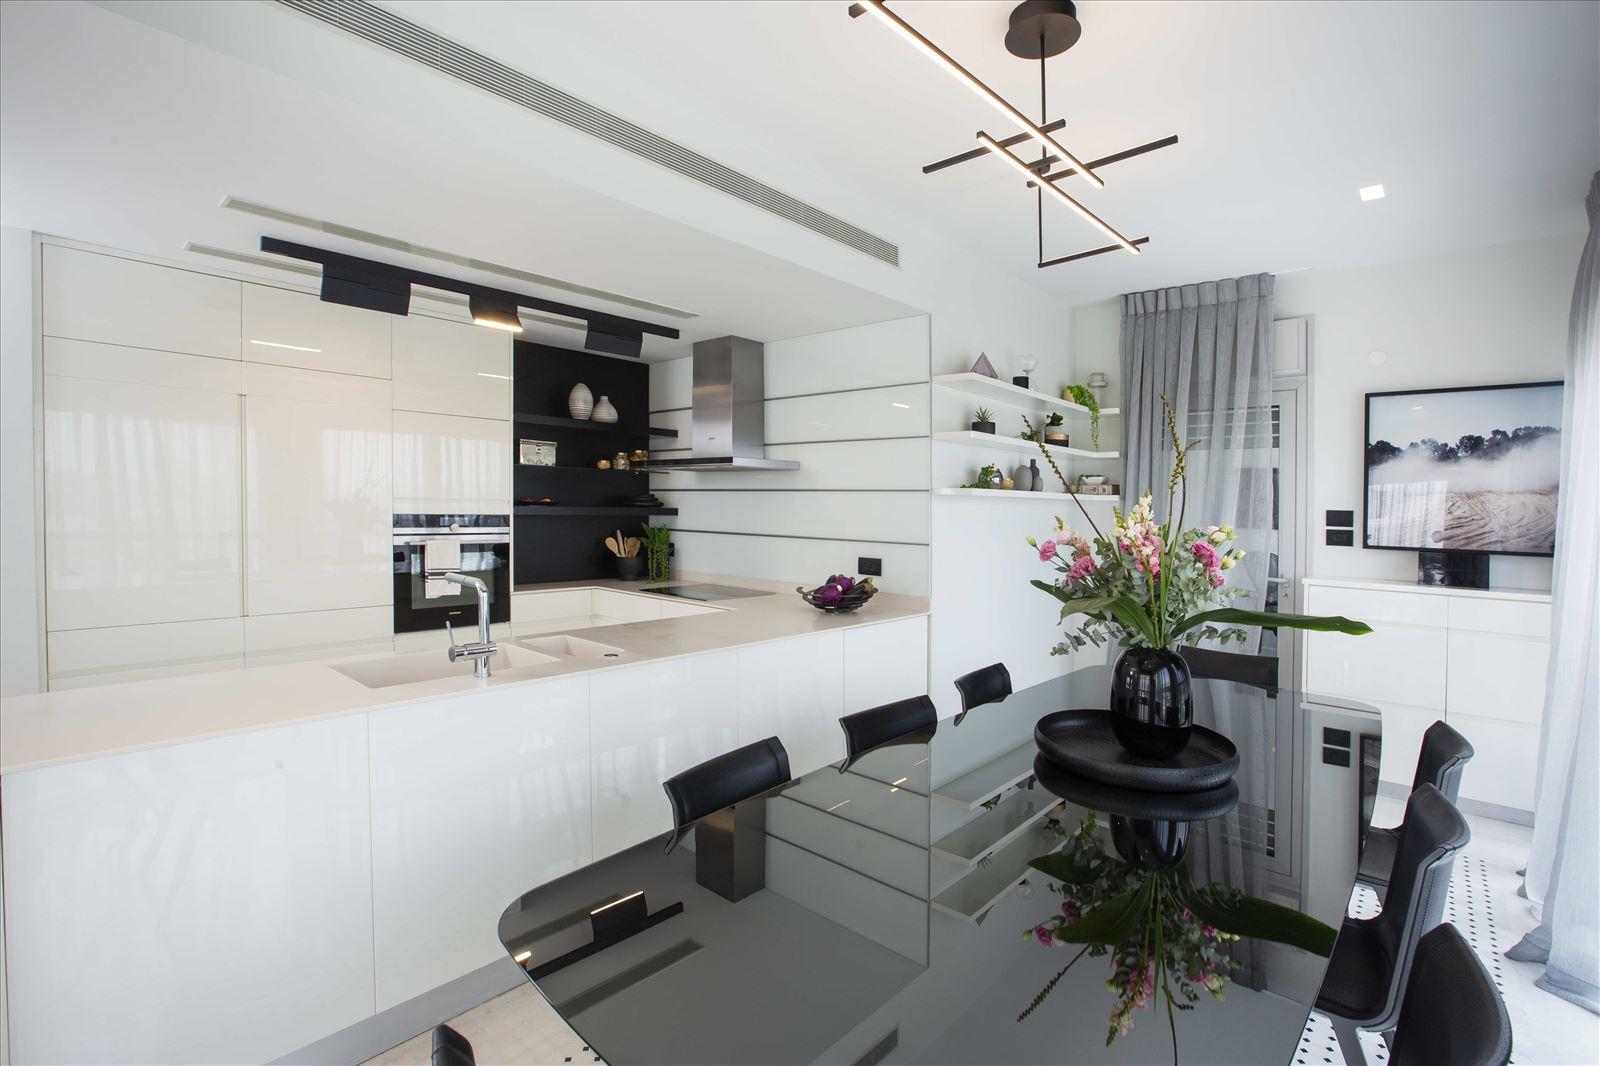 Tel Aviv apartment in Parisian aroma תאורה בפינת האוכל והמטבח